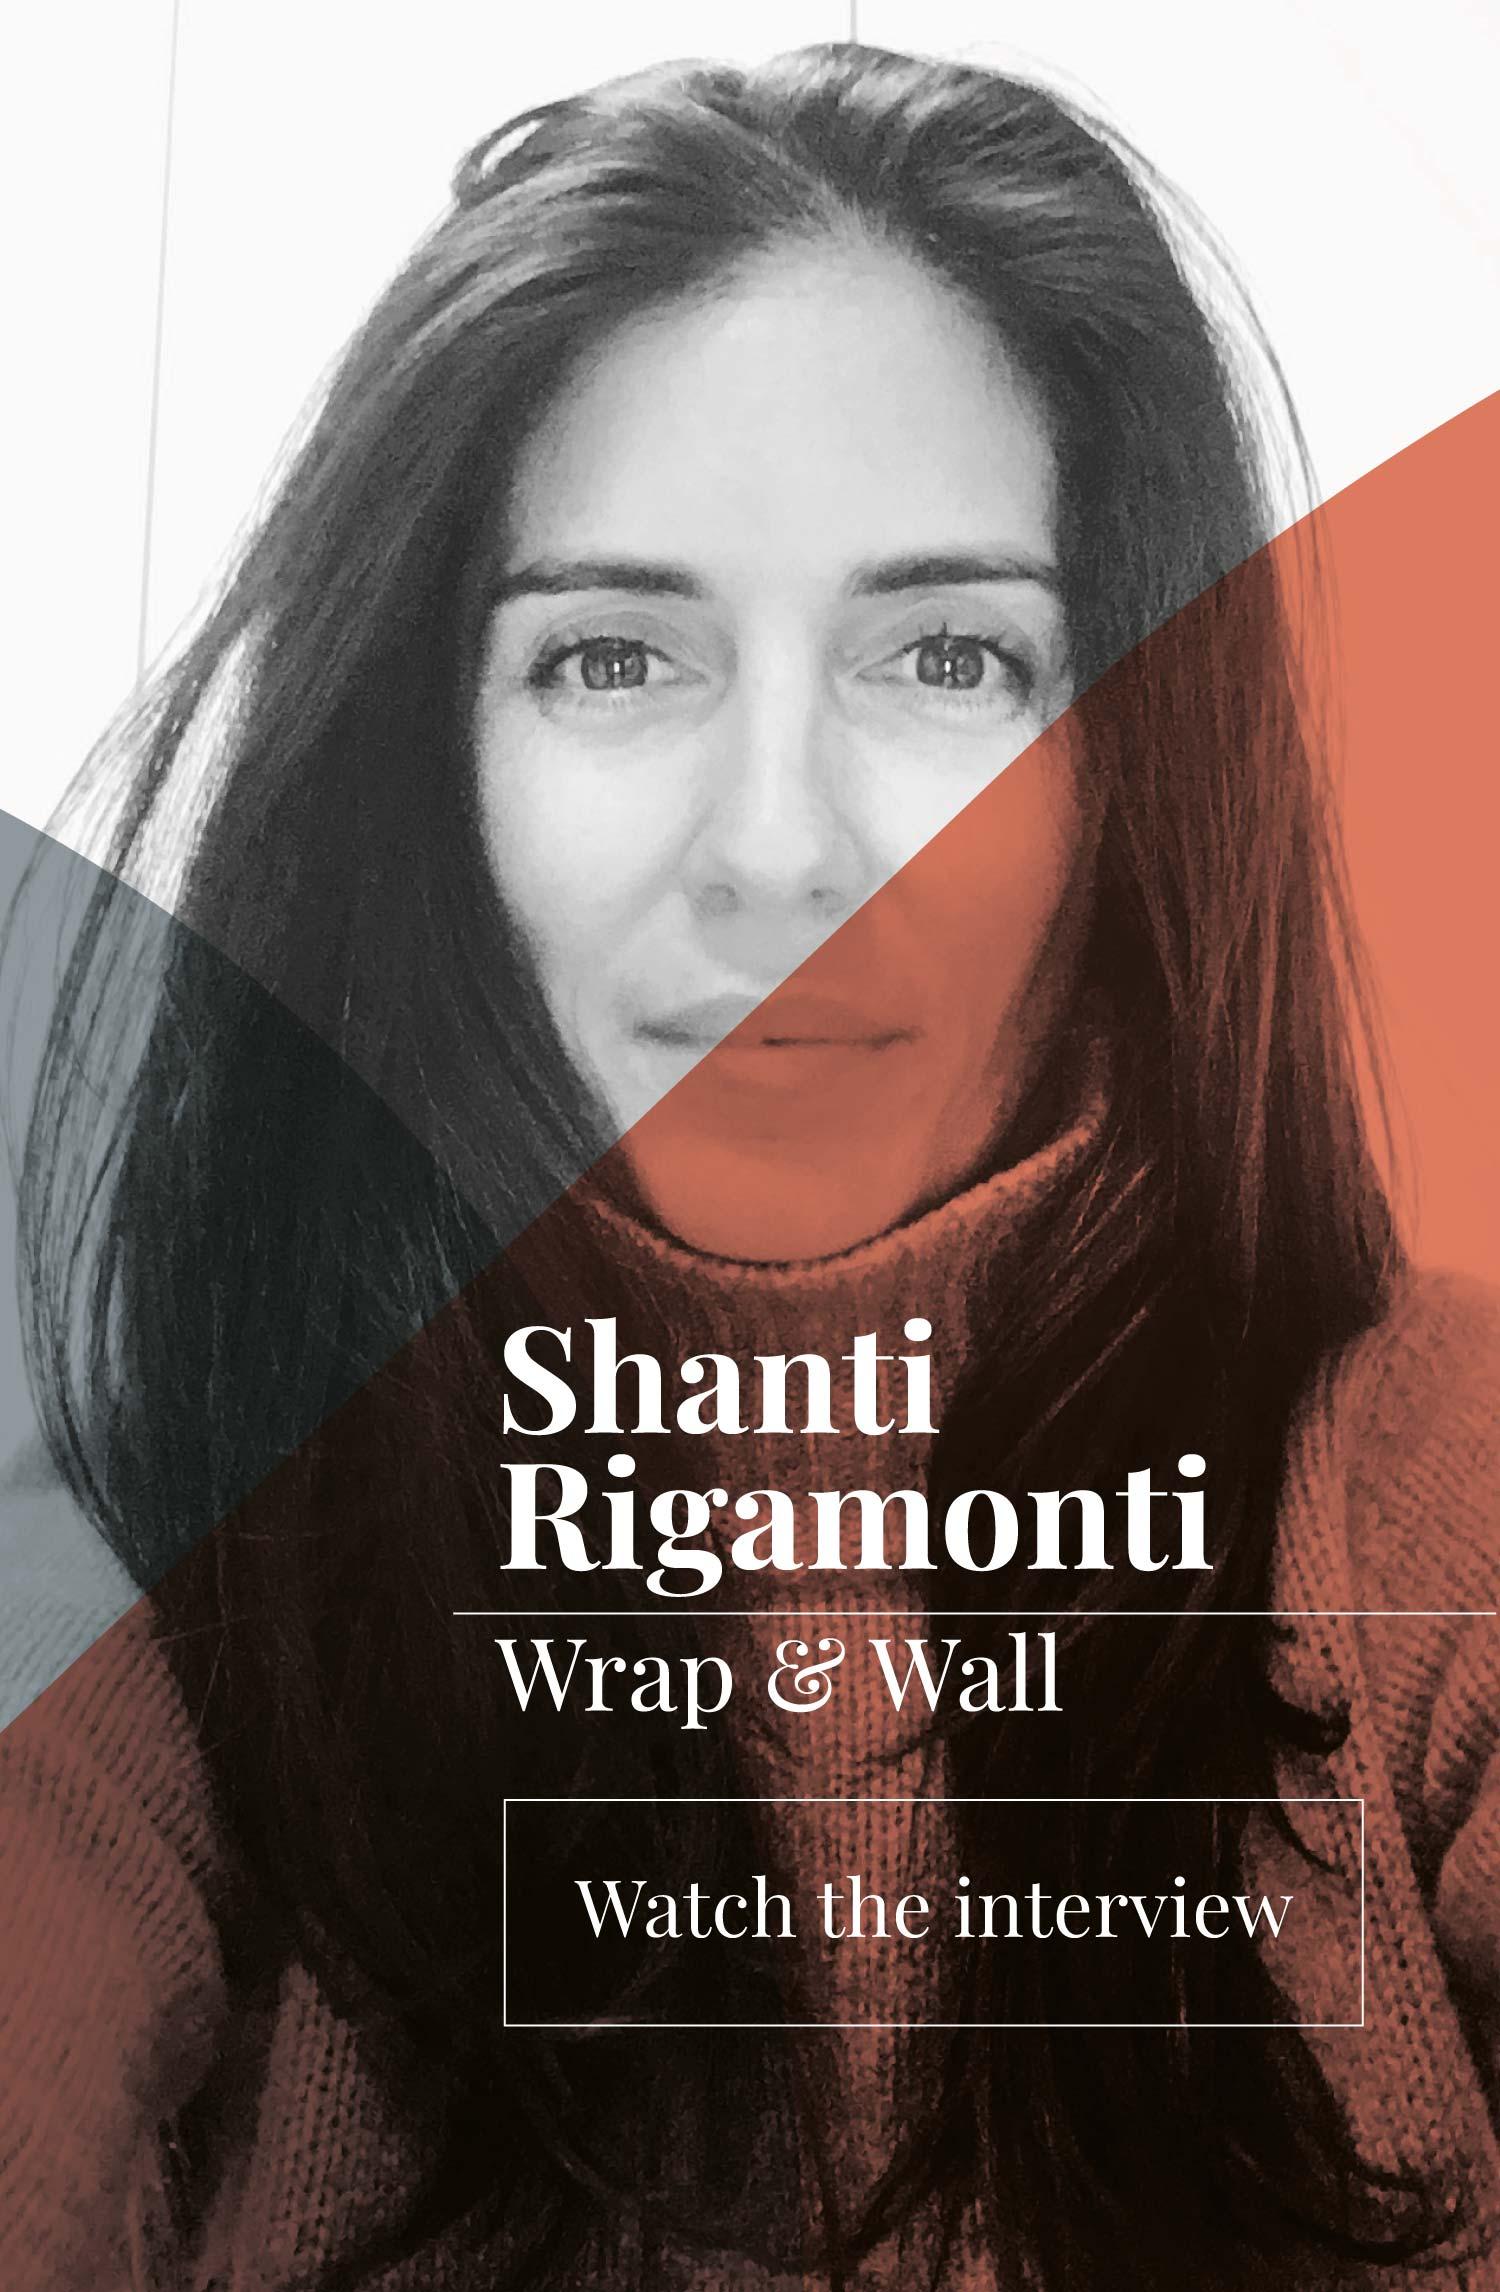 Shanti Rigamonti